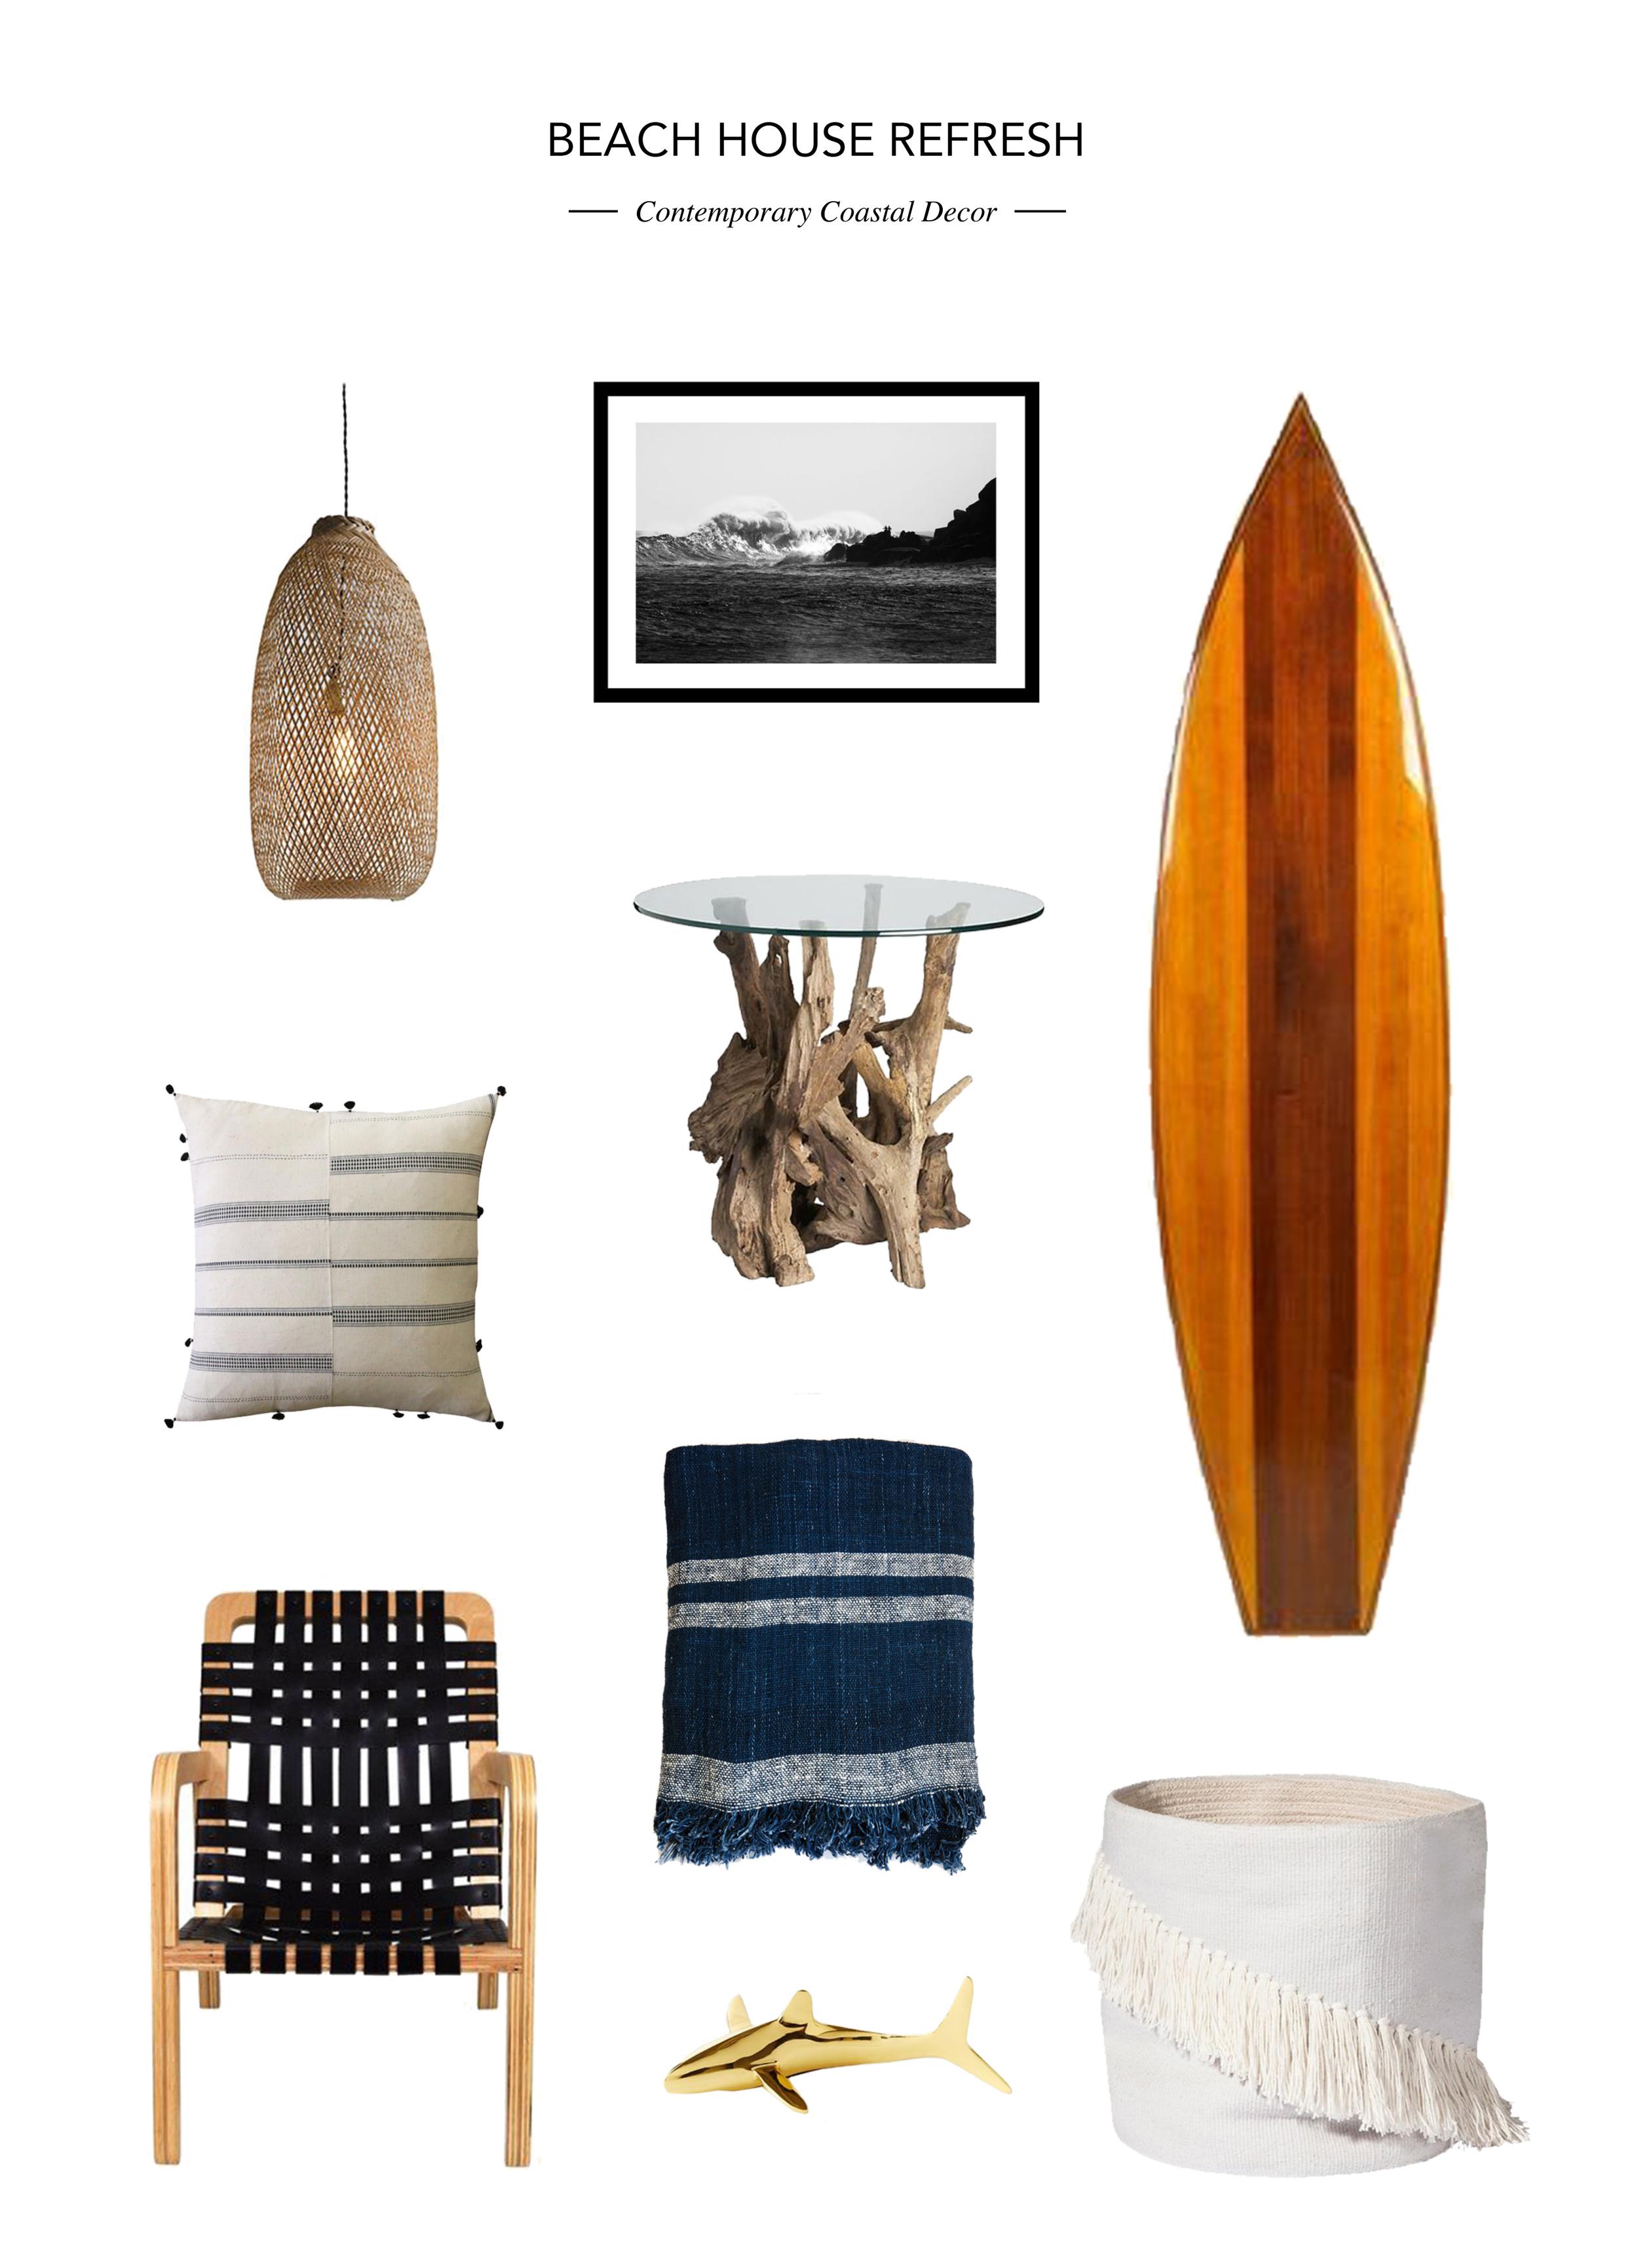 Lamp  //  Art  //  Surfboard  //  Pillow  //  Side Table  //  Chair  //  Blanket  //  Brass Shark  //  Basket